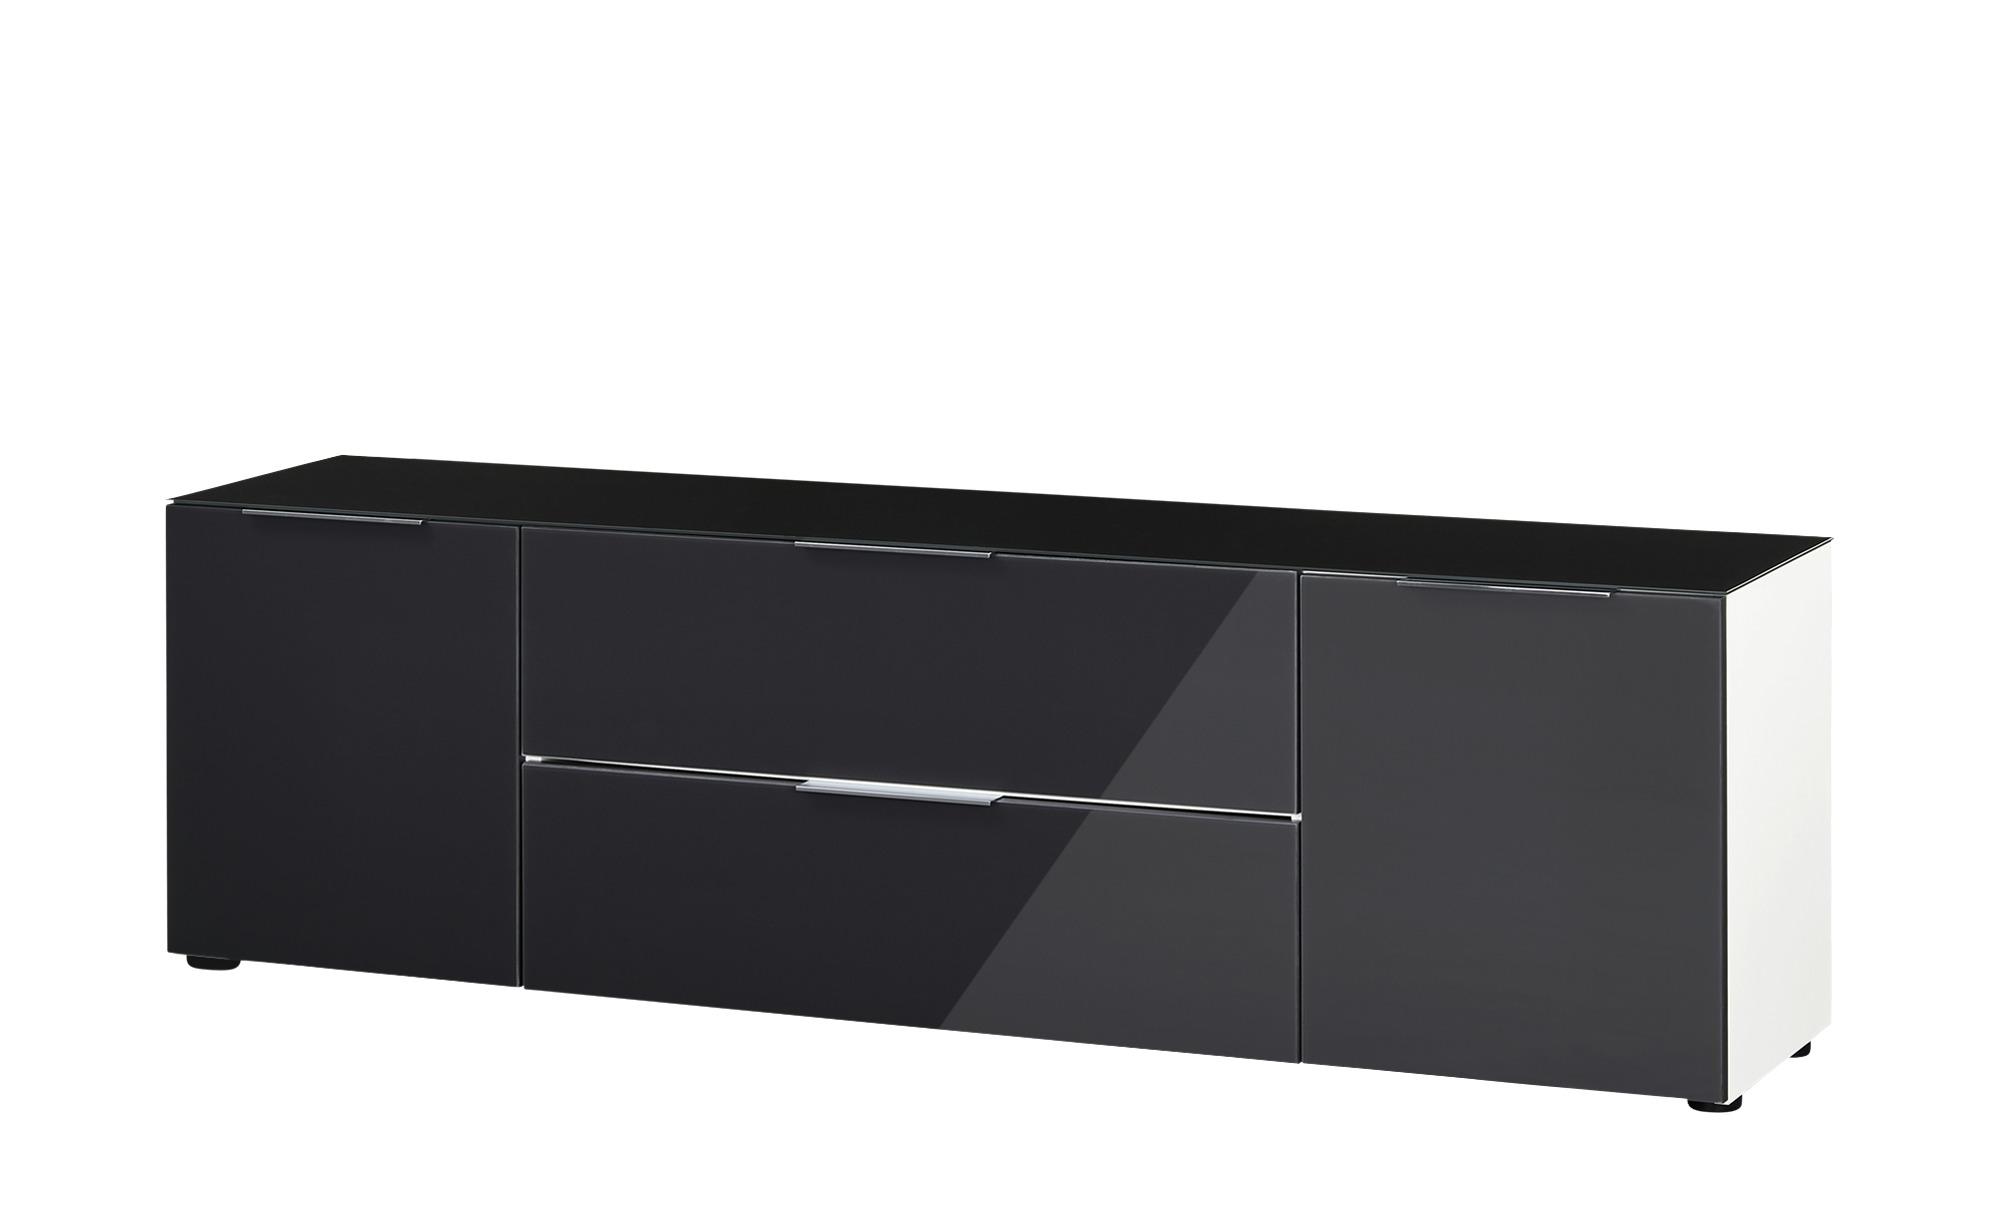 Lowboard  Vitreo ¦ grau ¦ Maße (cm): B: 180,4 H: 53,9 T: 40 TV- & Media Möbel > TV-Racks - Höffner